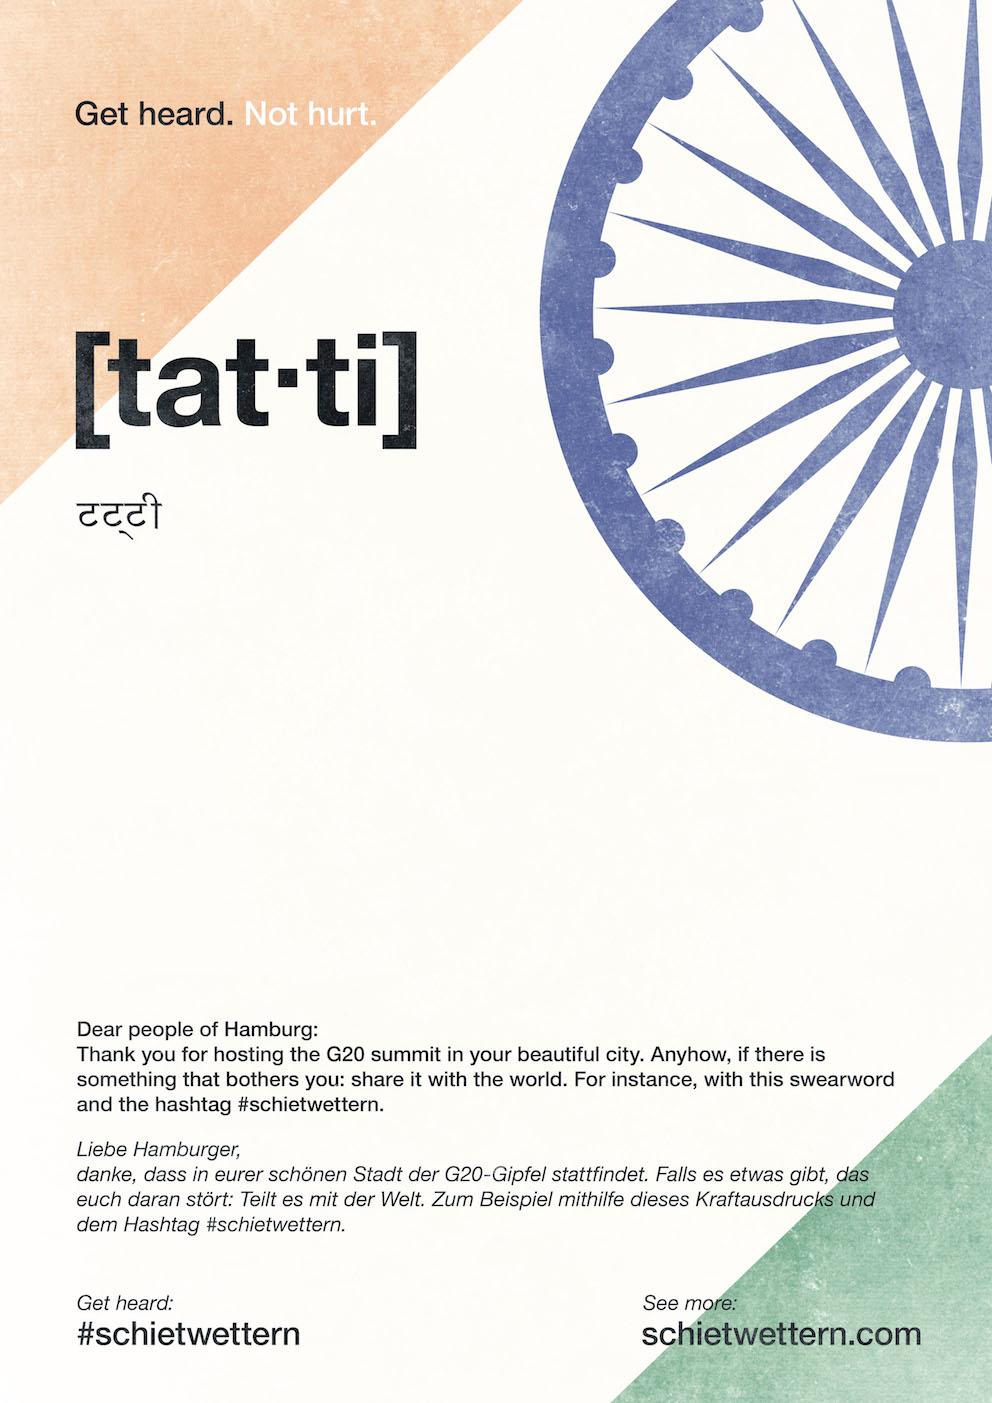 schietwettern__0012_India.jpg